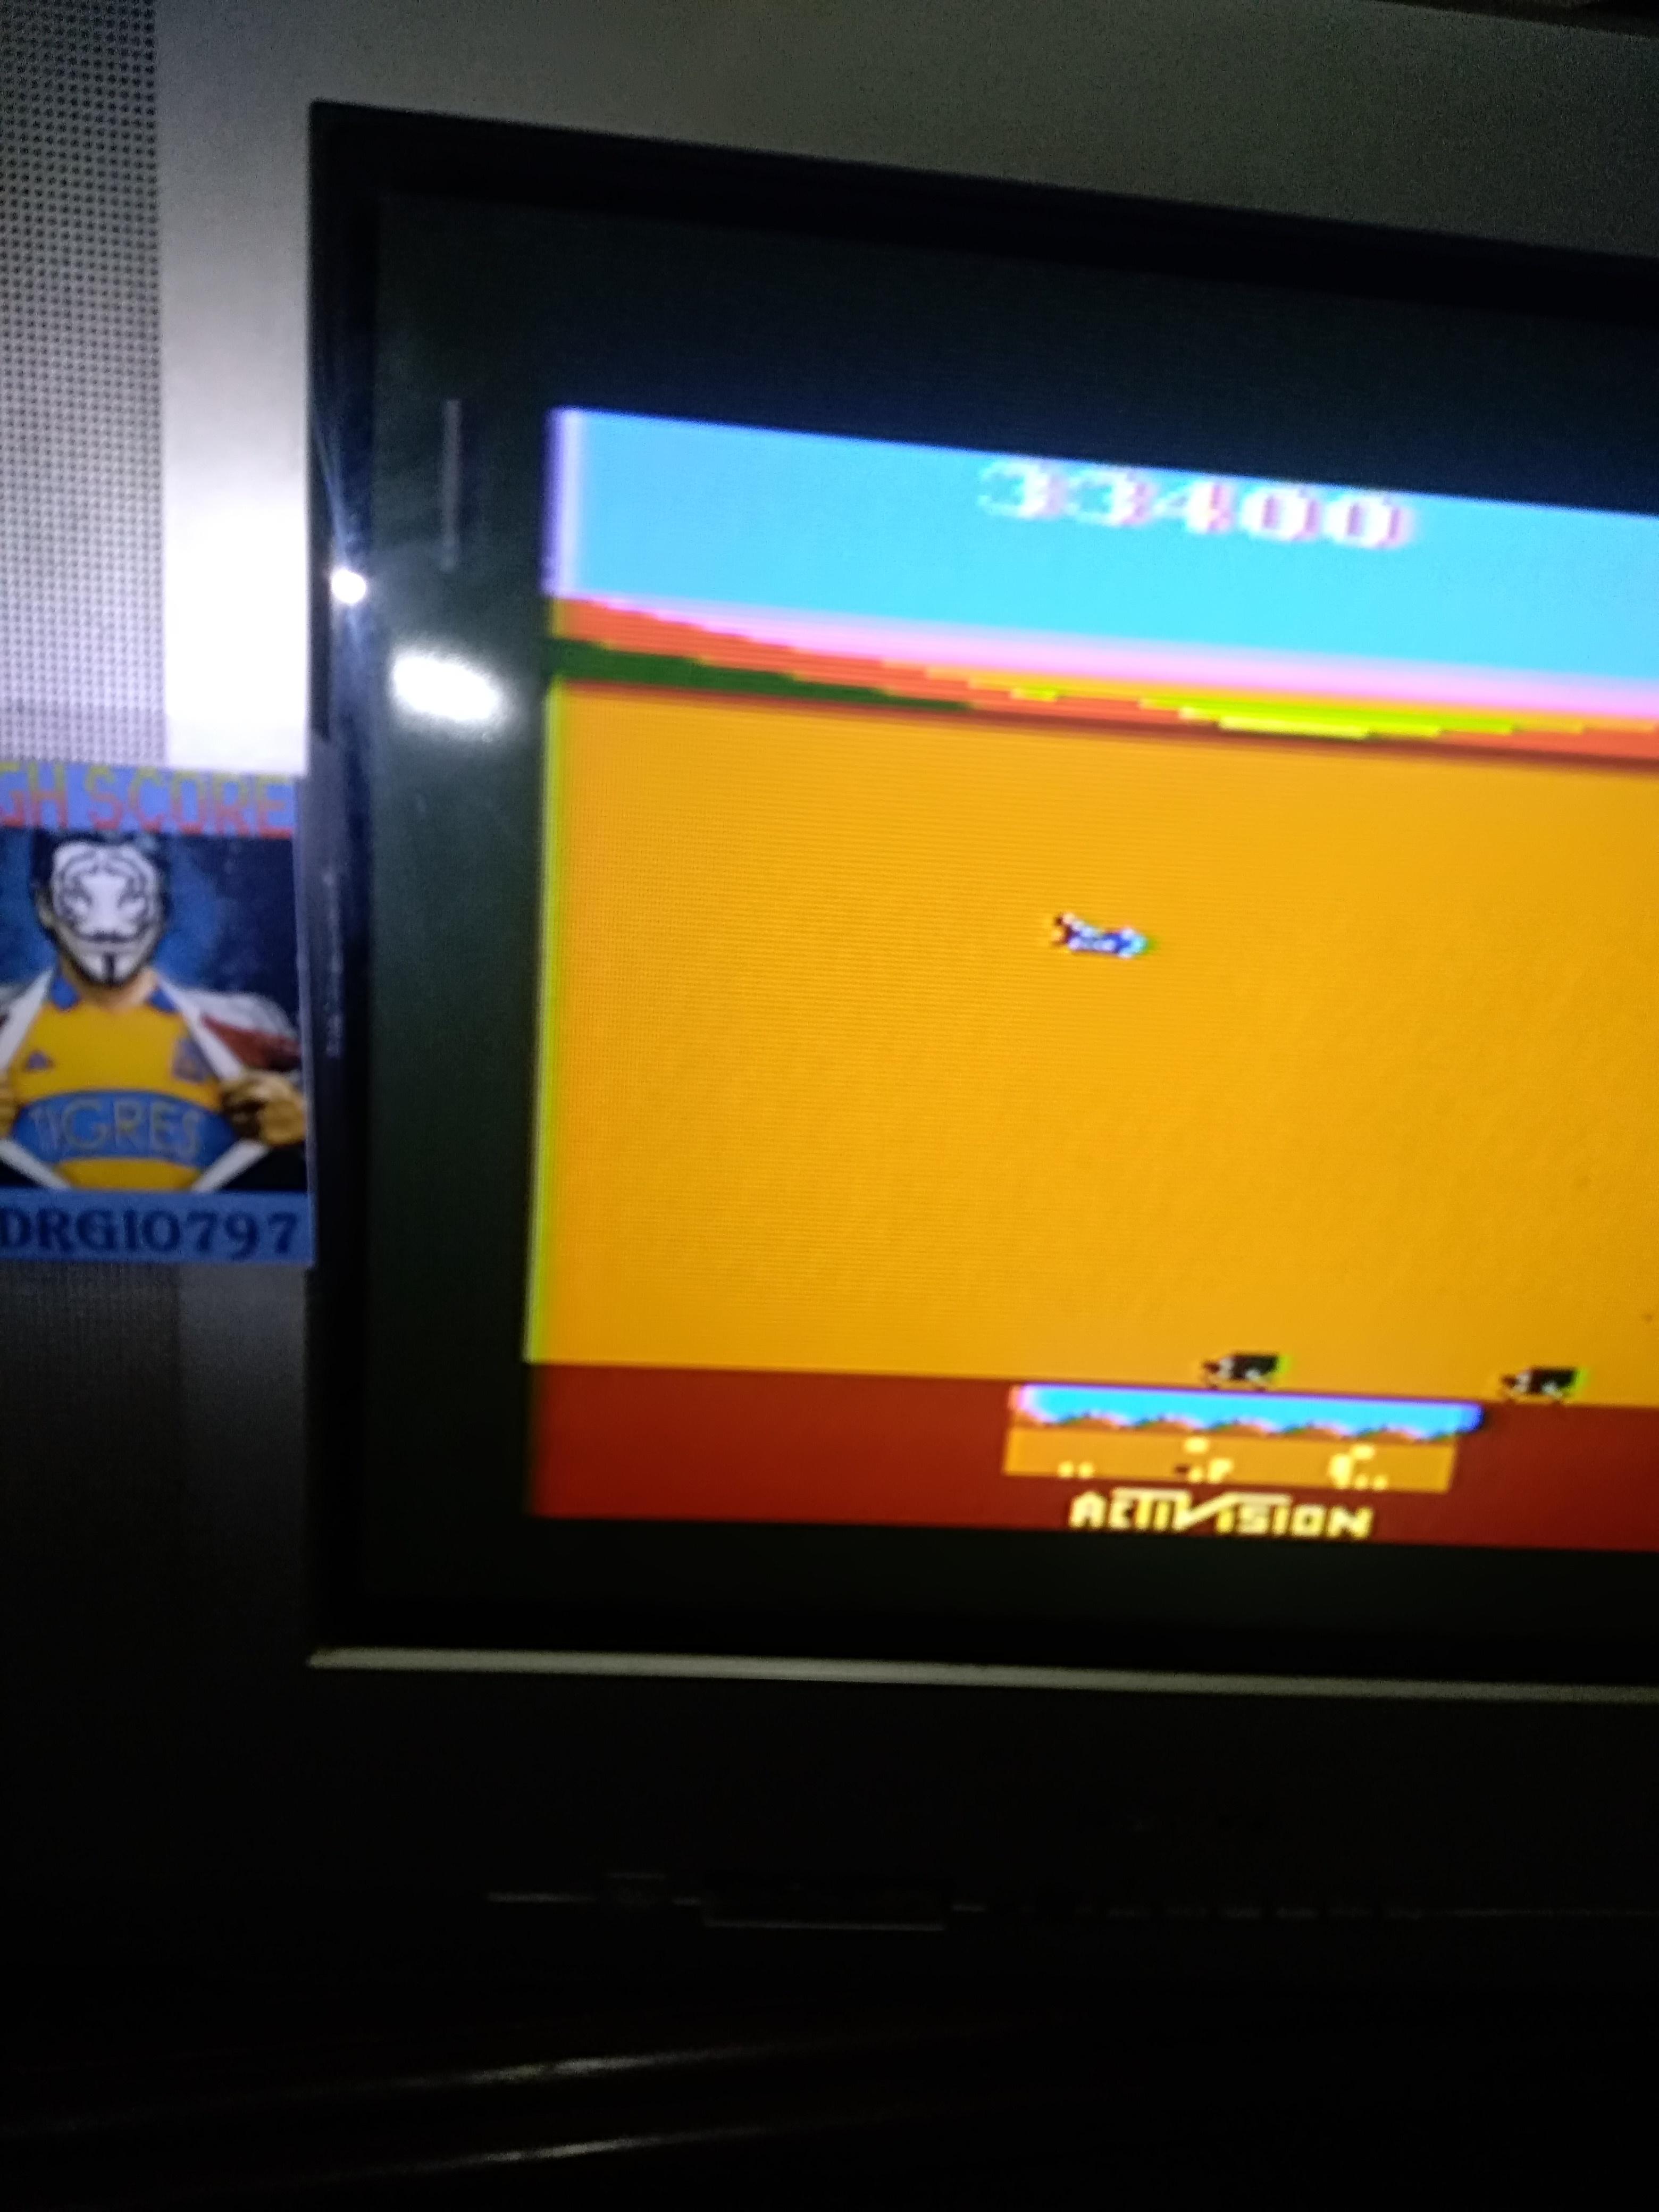 Sdrgio797: Chopper Command (Atari 2600 Expert/A) 33,400 points on 2020-07-27 00:58:46